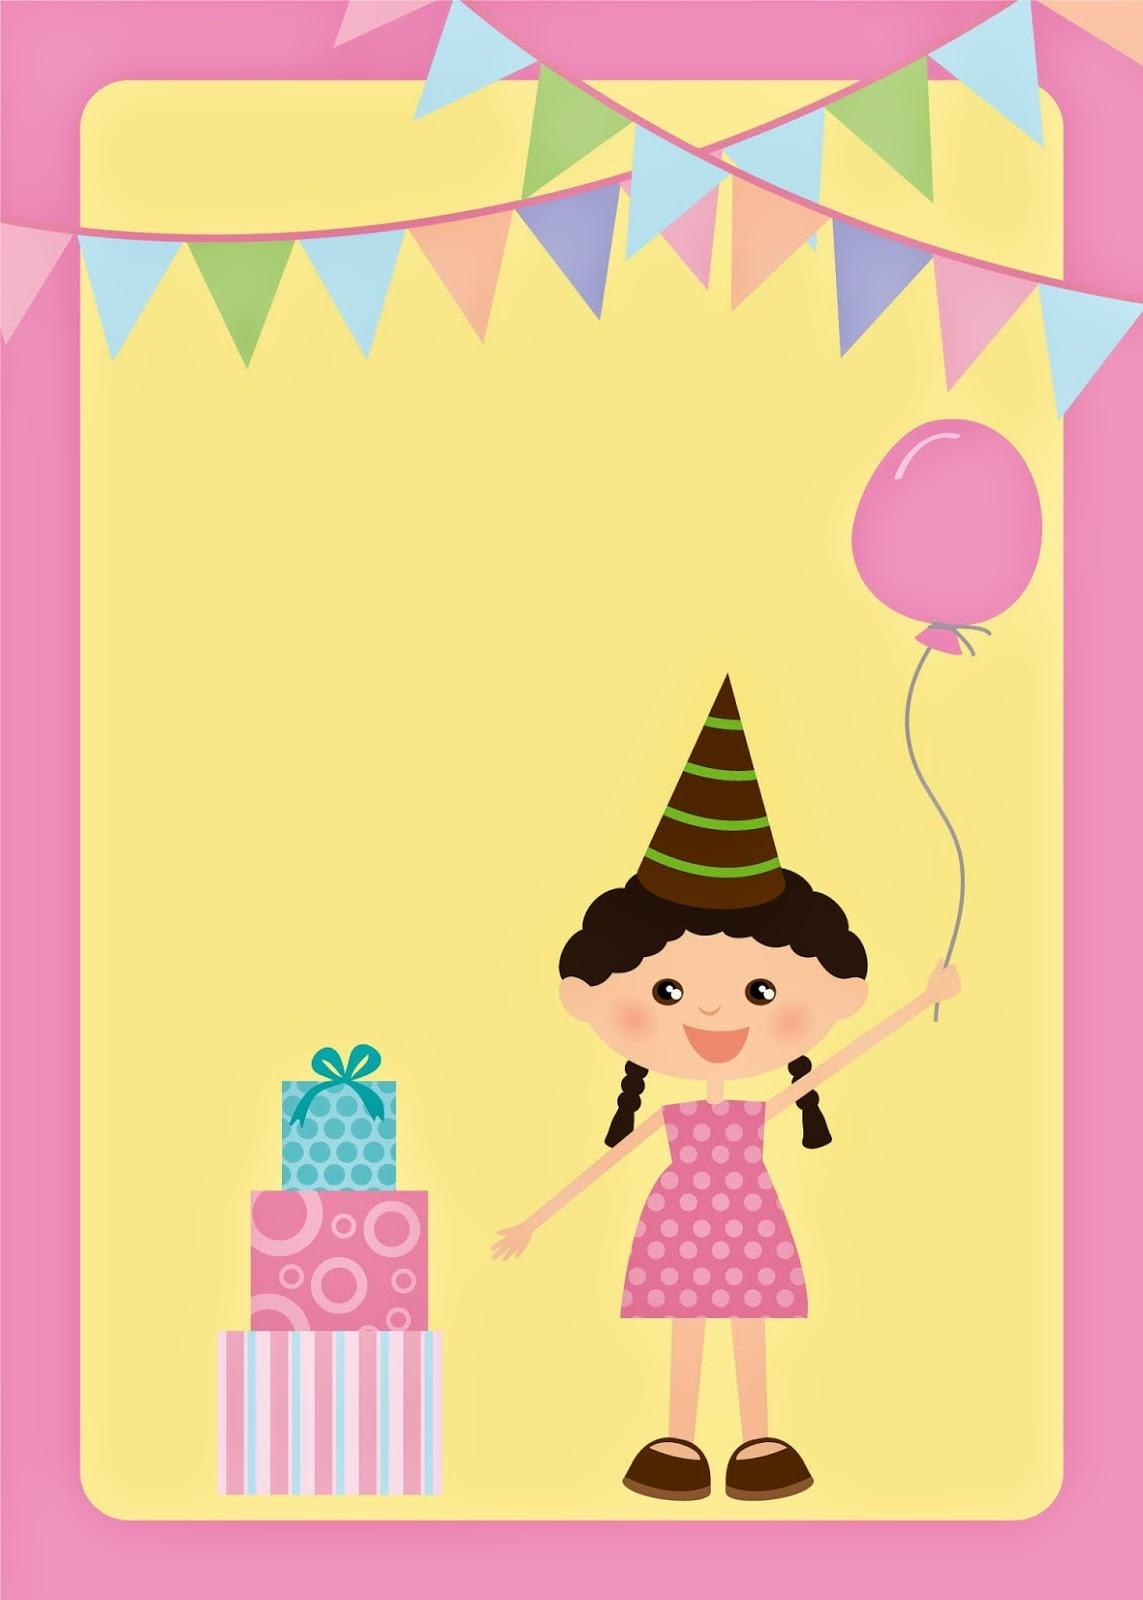 Kids Birthday Party Free Printable Invitations. - Oh My Fiesta! In - Free Printable Kids Birthday Cards Boys